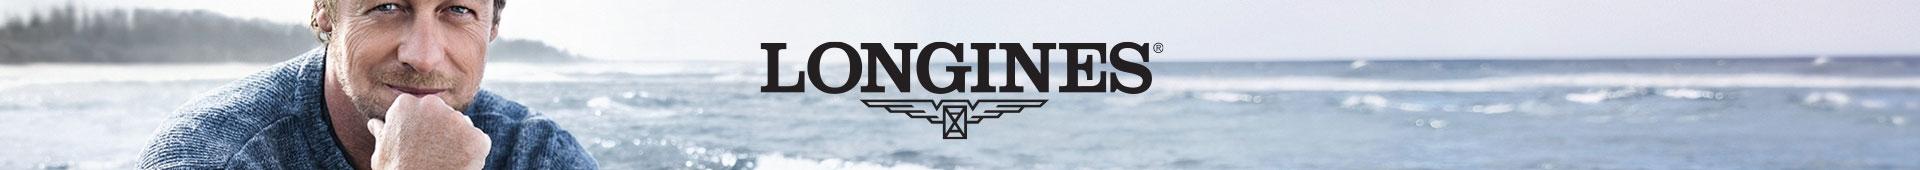 Longines Heritage Watches